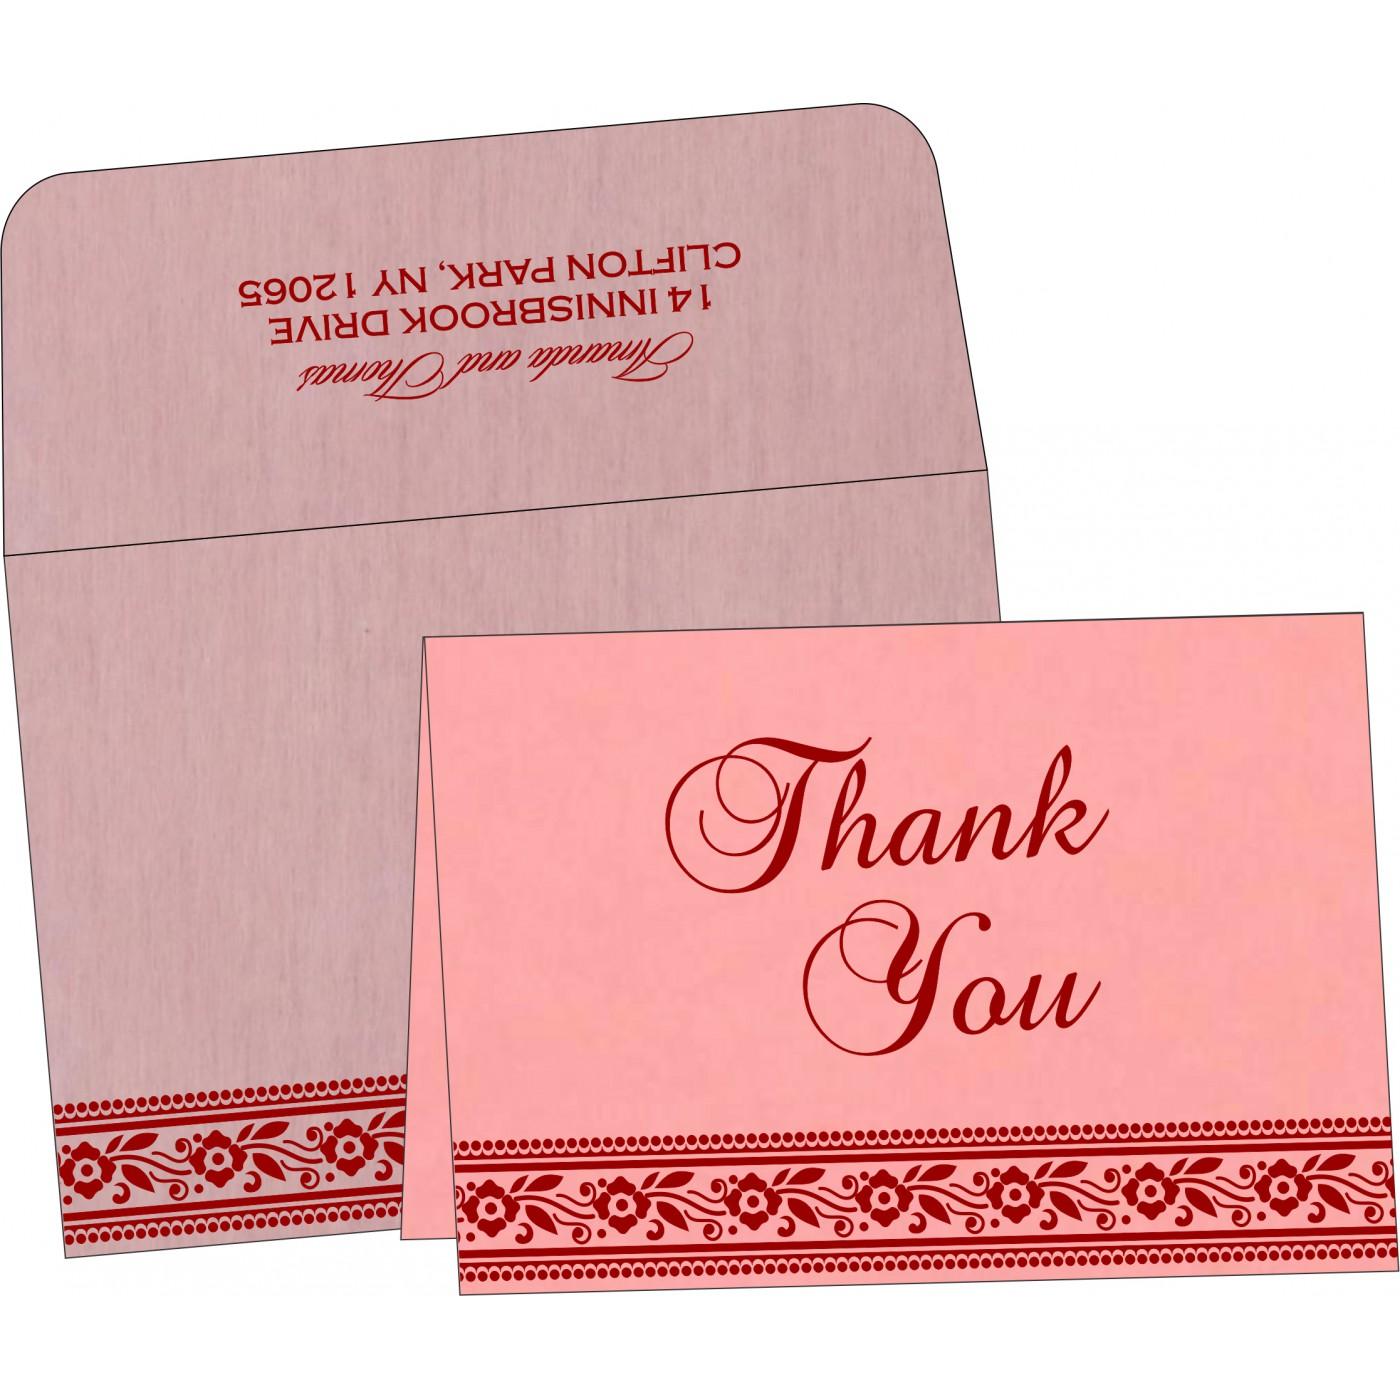 Thank You Cards : TYC-8220J - 123WeddingCards